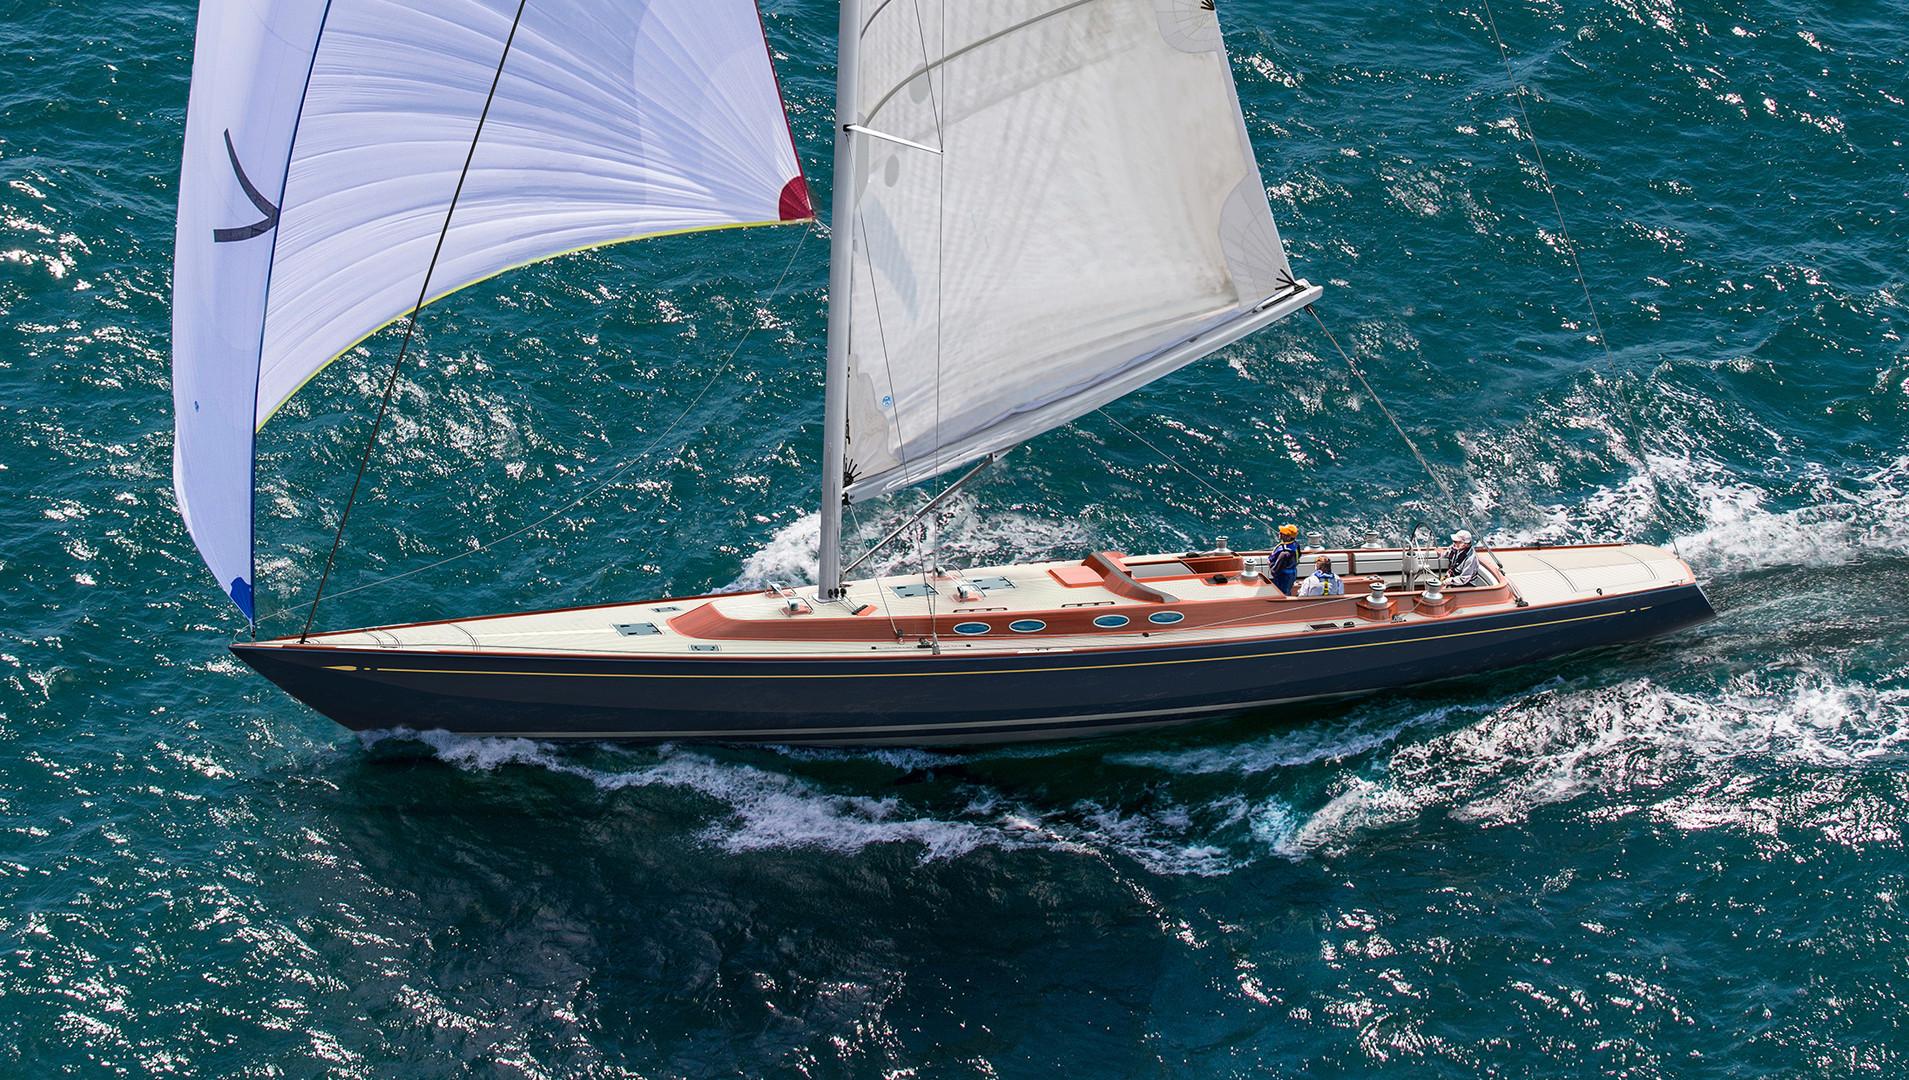 Blue Swede Sailing Web OAXS Design yacht